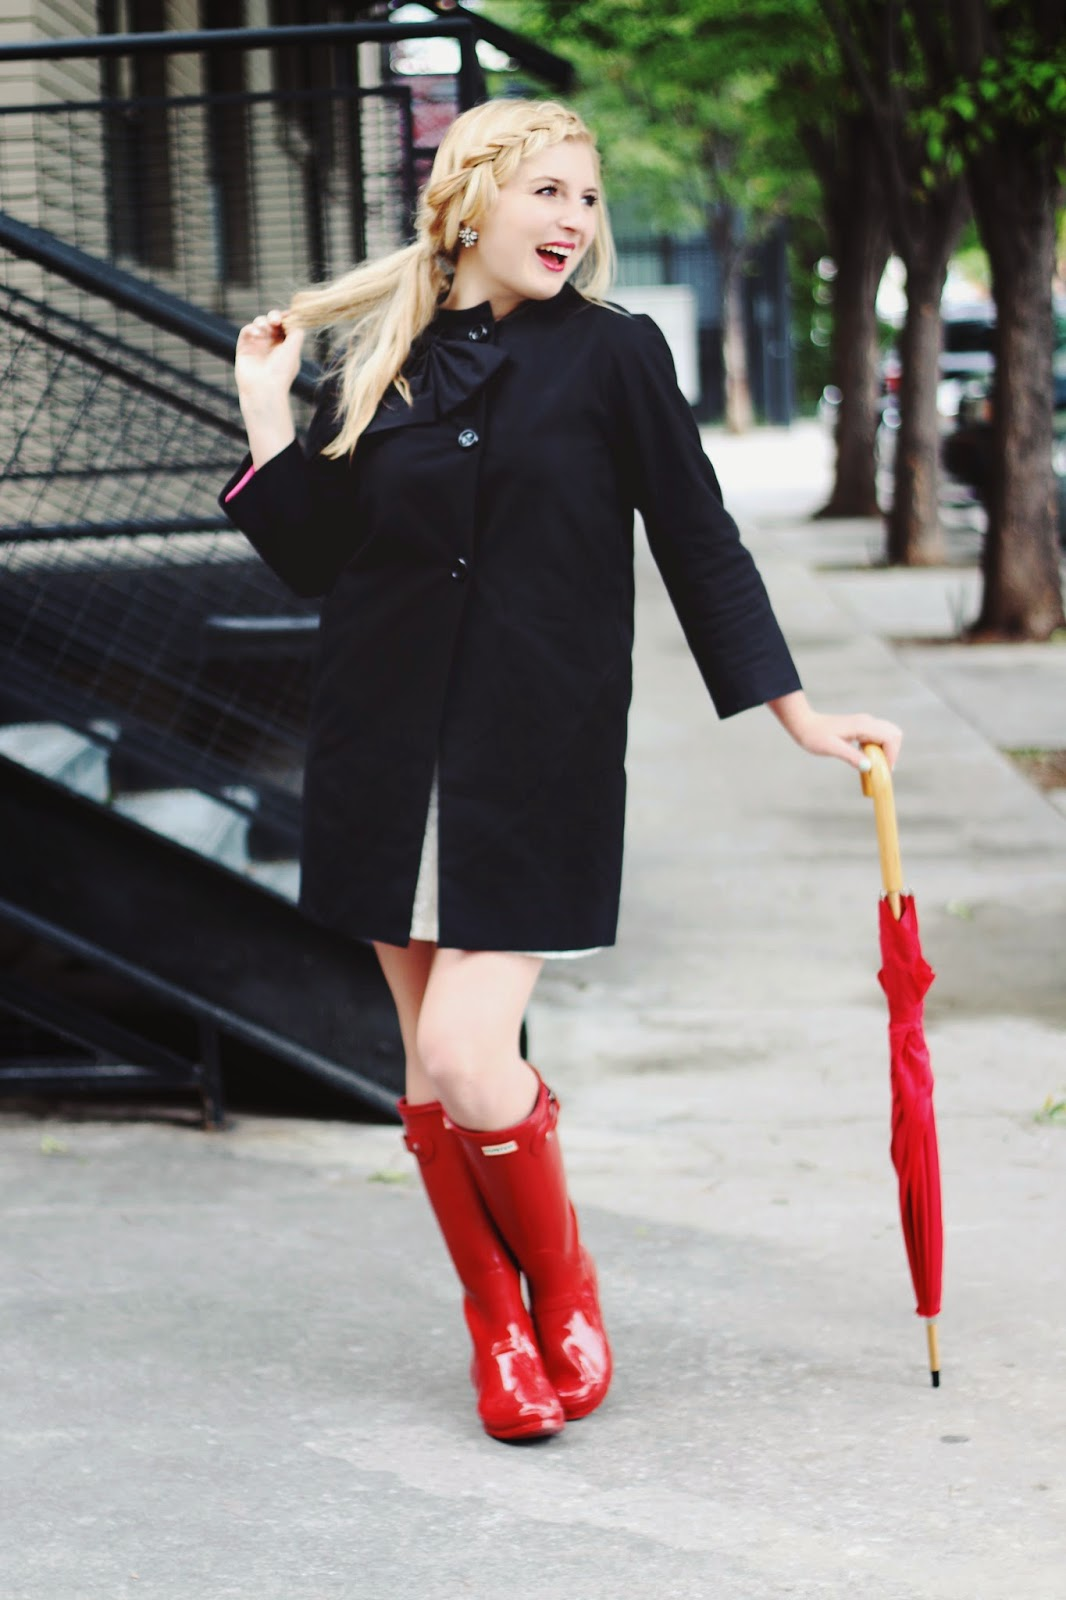 Red dress target umbrella